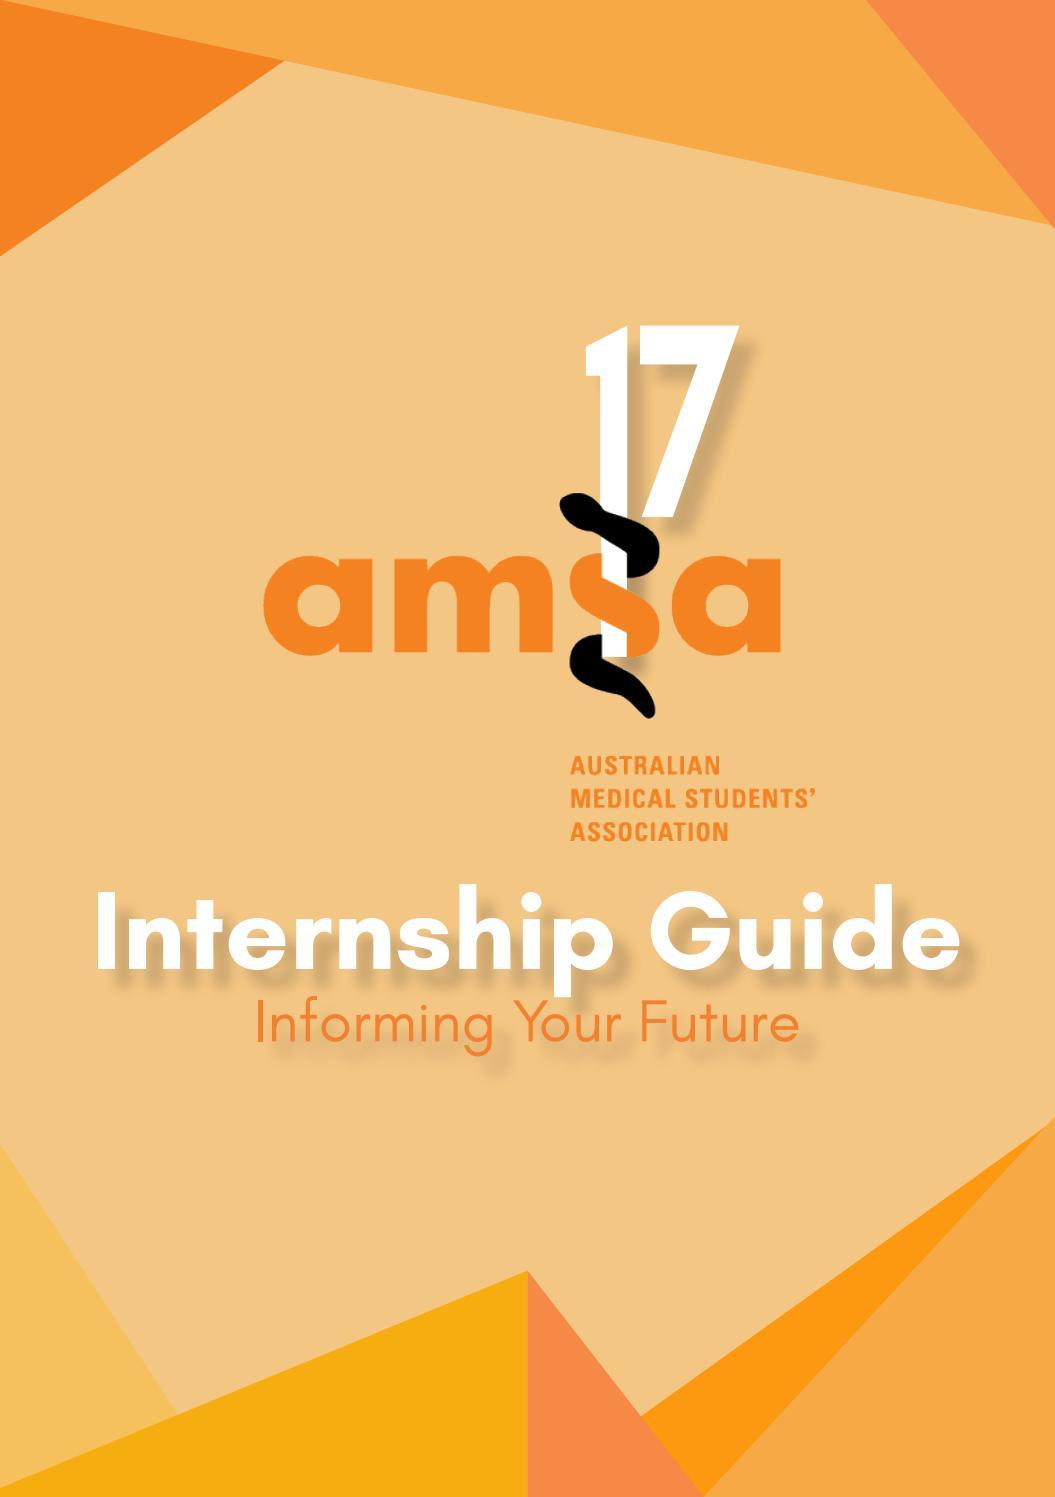 AMSA Internship Guide 2017 by The Australian Medical